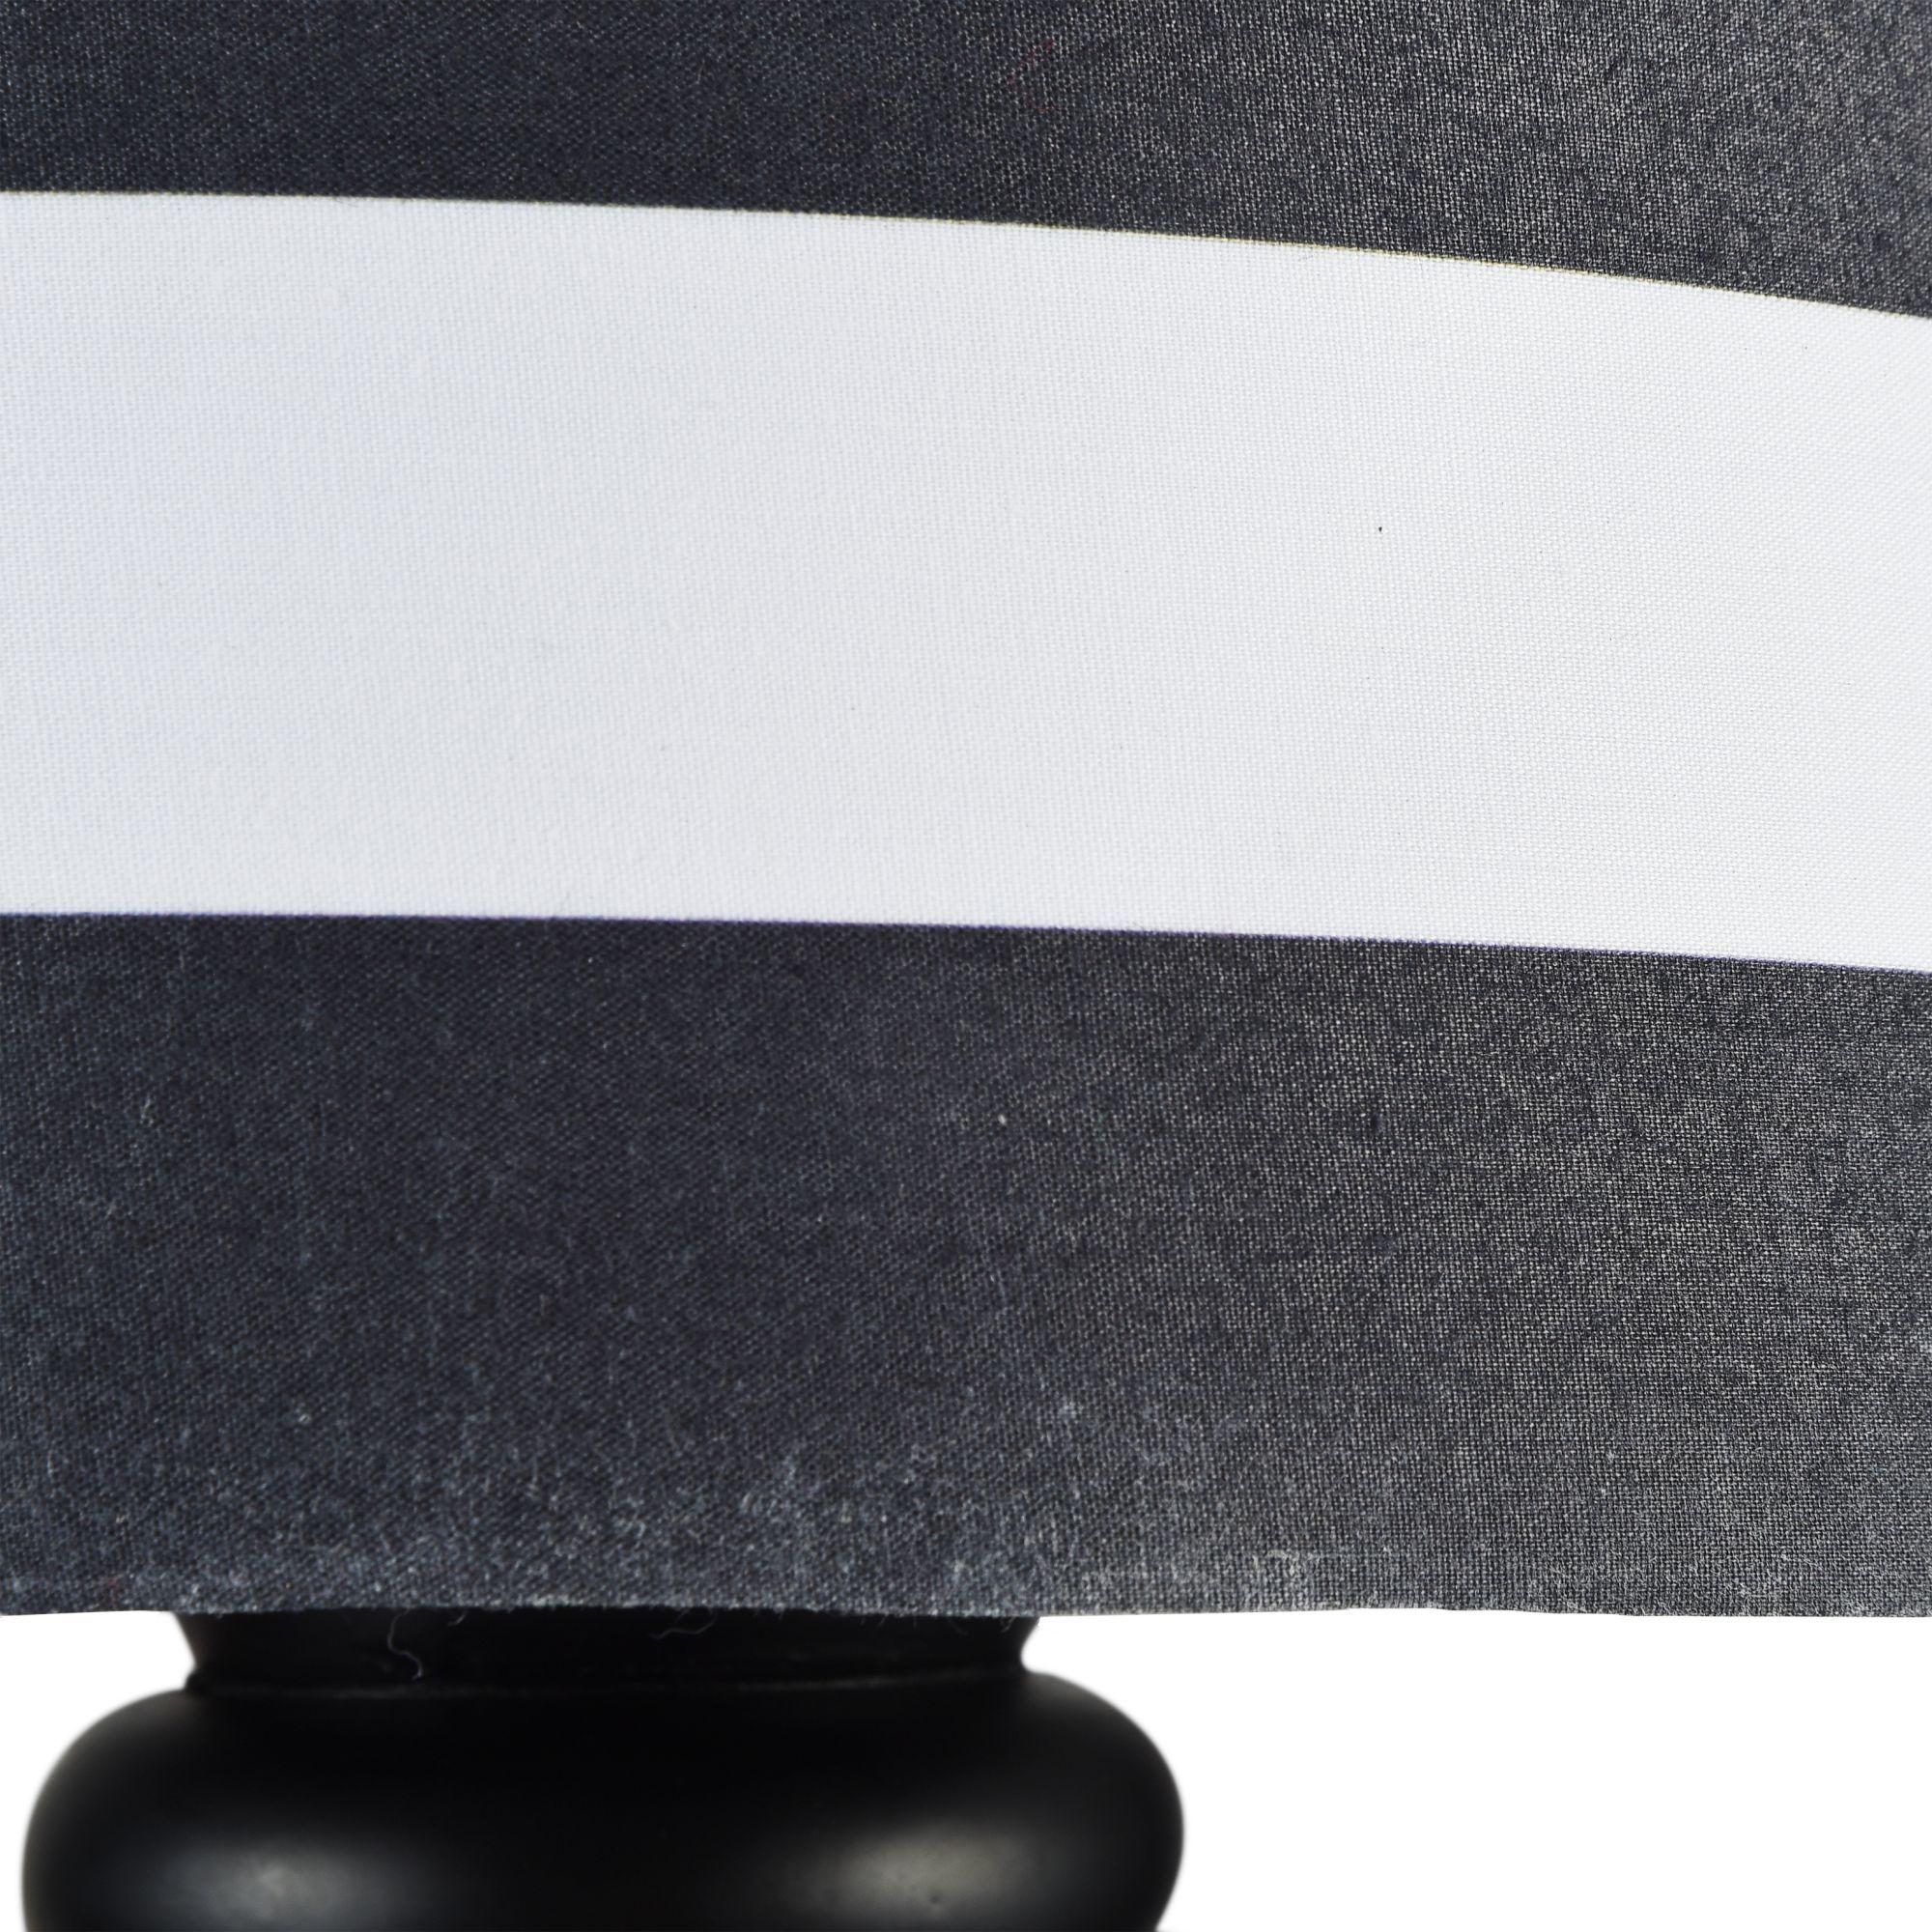 Бра Maytoni Modern Sailor MOD963-WL-01-B, 1xE14x40W, черный, черно-белый, металл, текстиль - фото 7